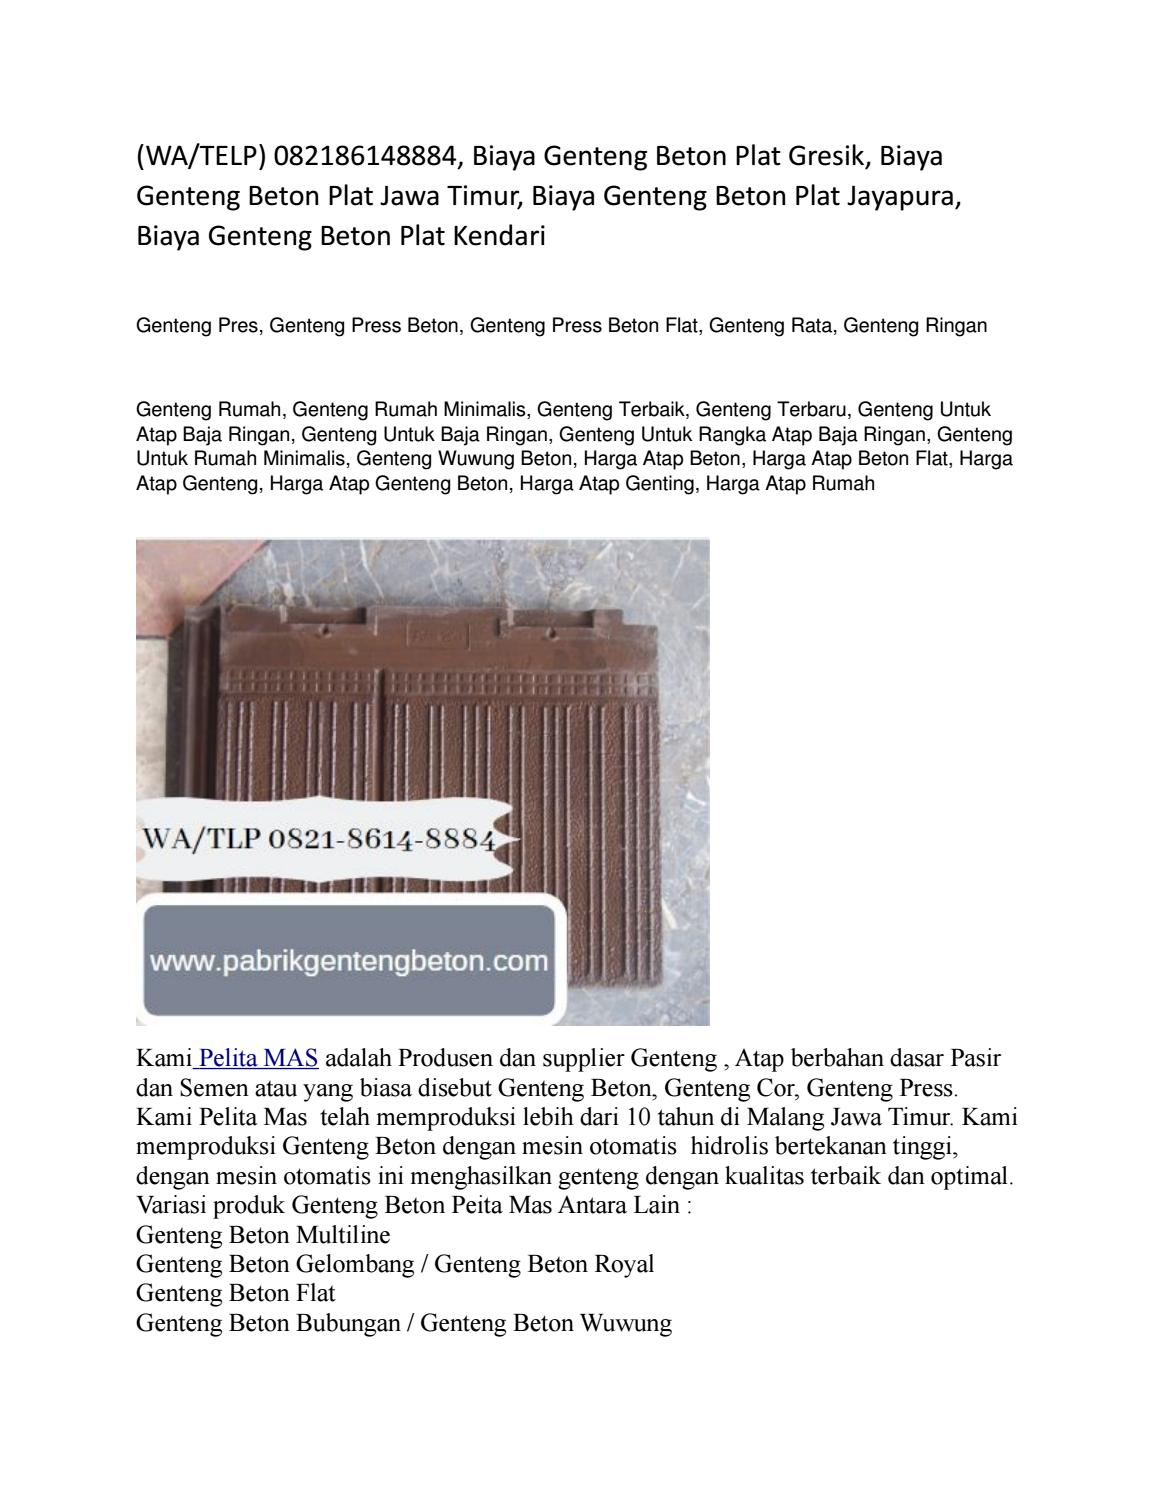 harga atap baja ringan dan genteng beton wa telp 082186148884 biaya rata sulawesi